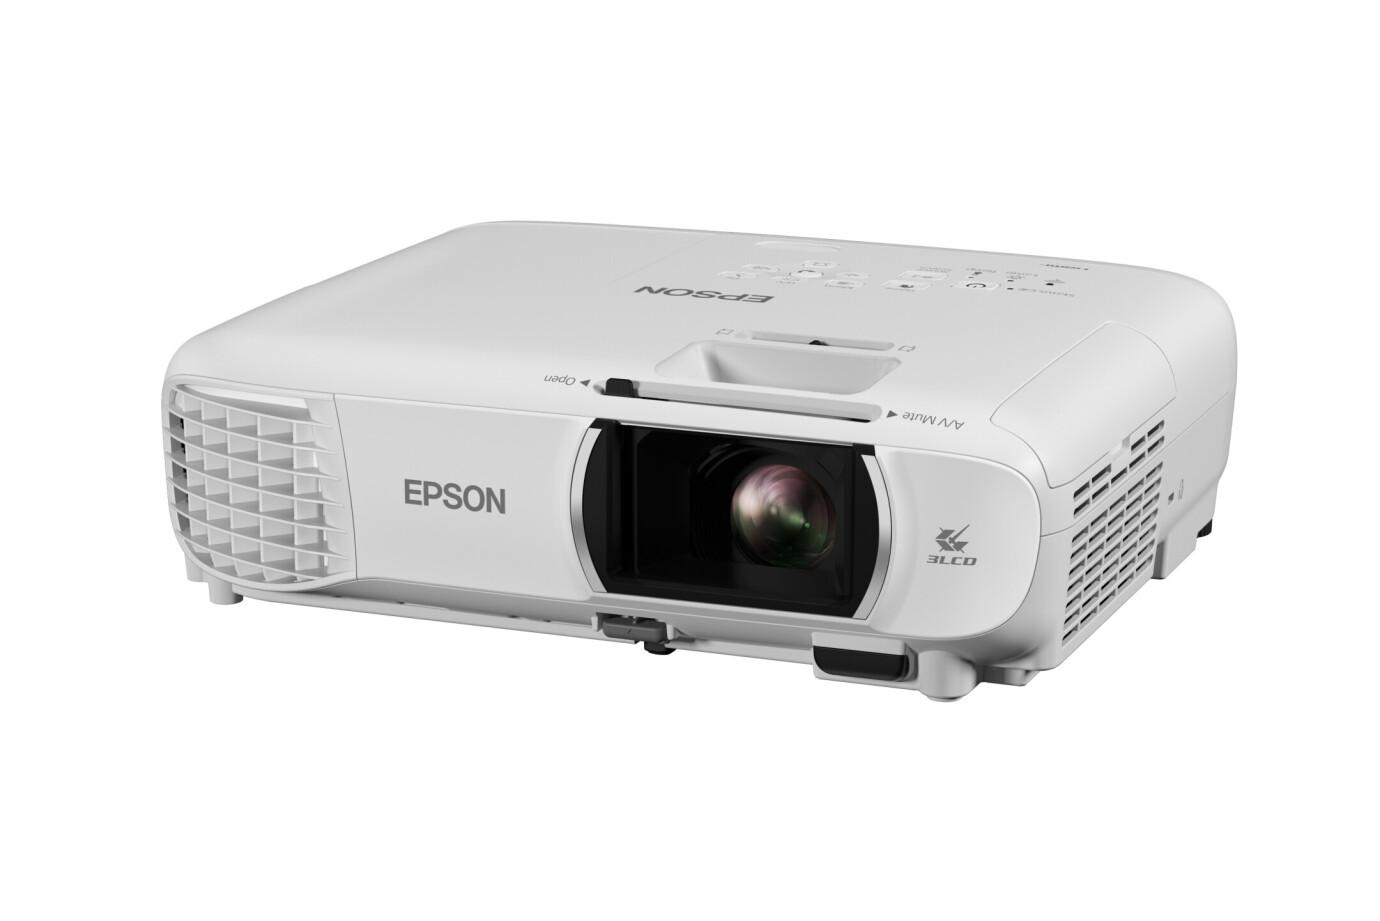 Epson EH-TW750 - Demoware Gold